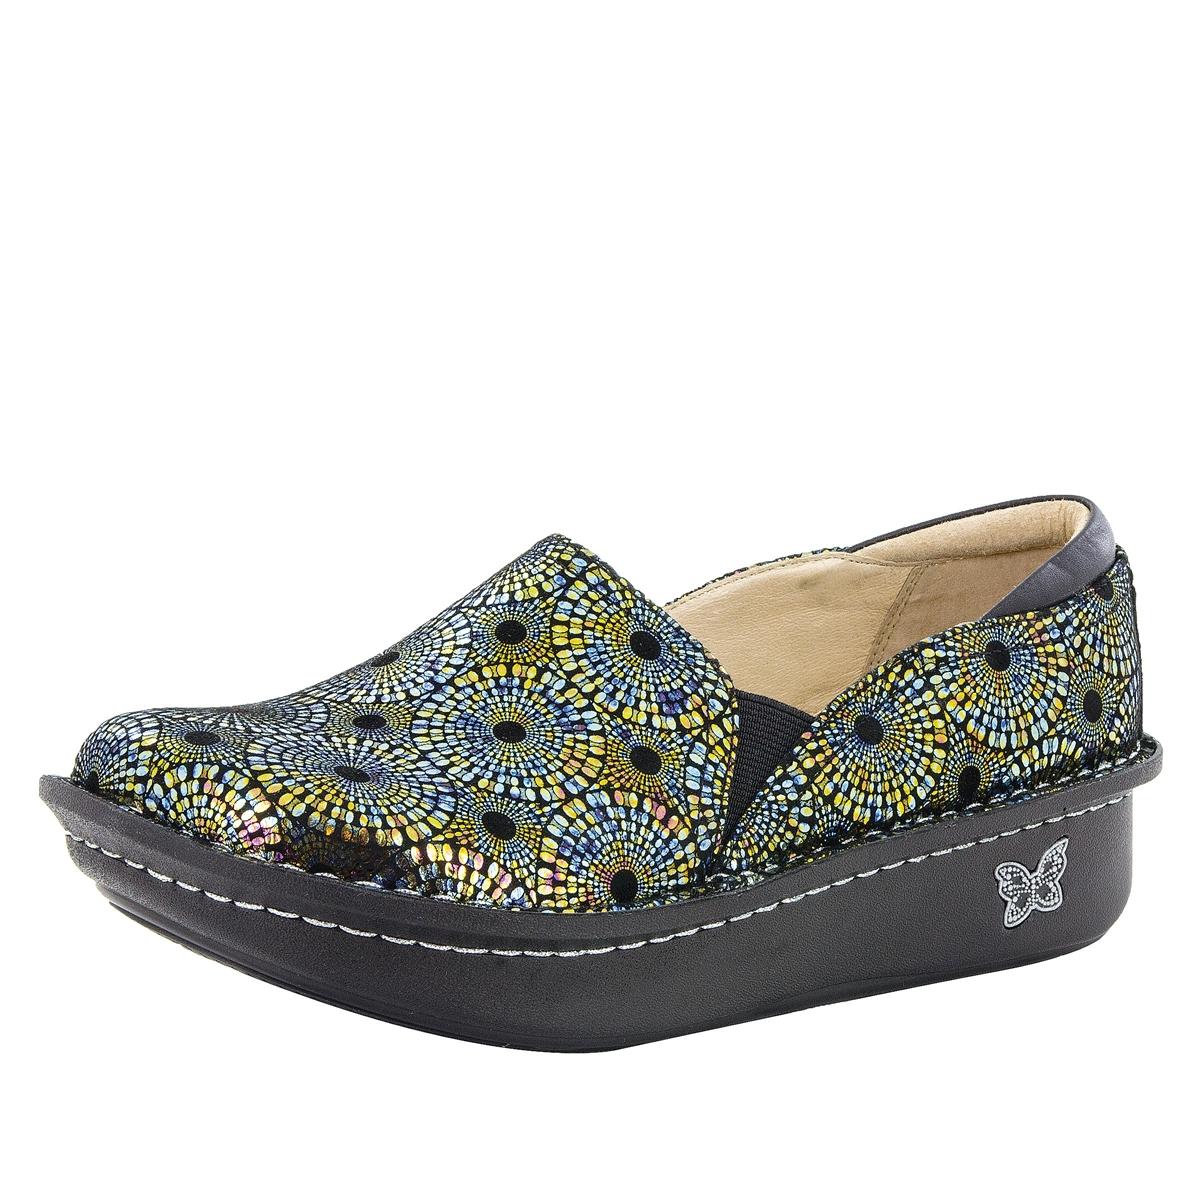 Alegria Debra Spin Dr Nursing Shoes